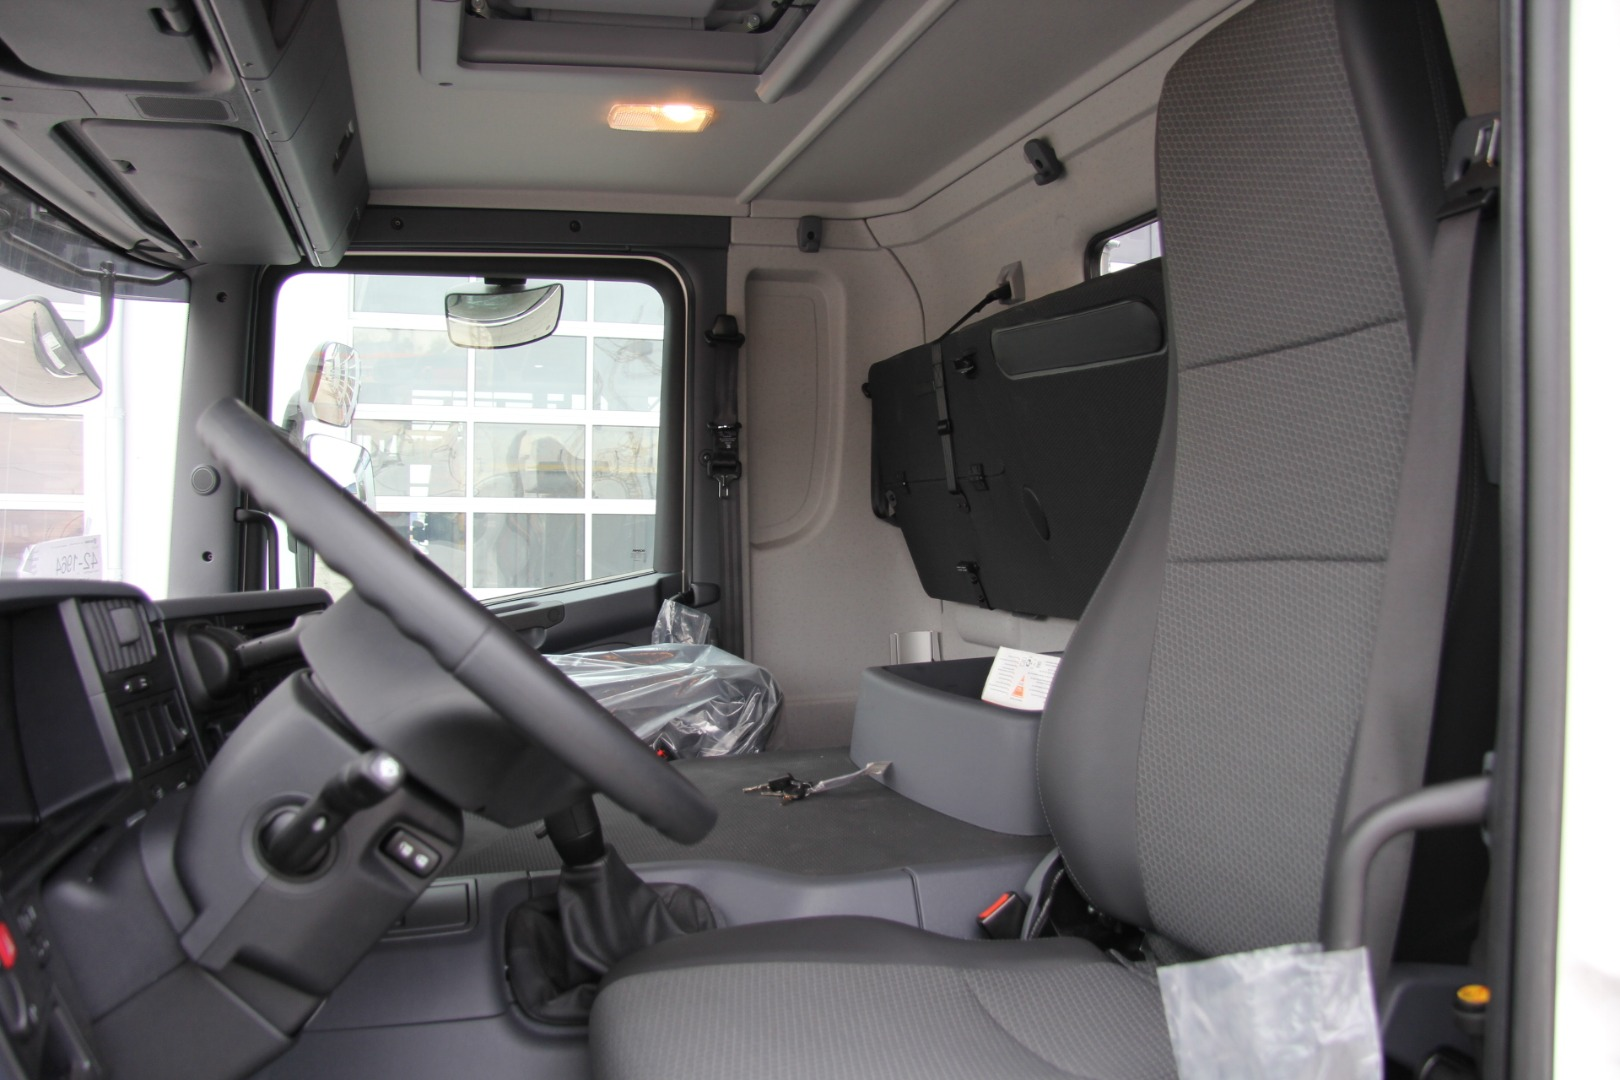 кабина самосвала Р400 Скания самосвалы хабаровск якутия магадан камчатка чукотка продажа сервис запчасти самосвалов